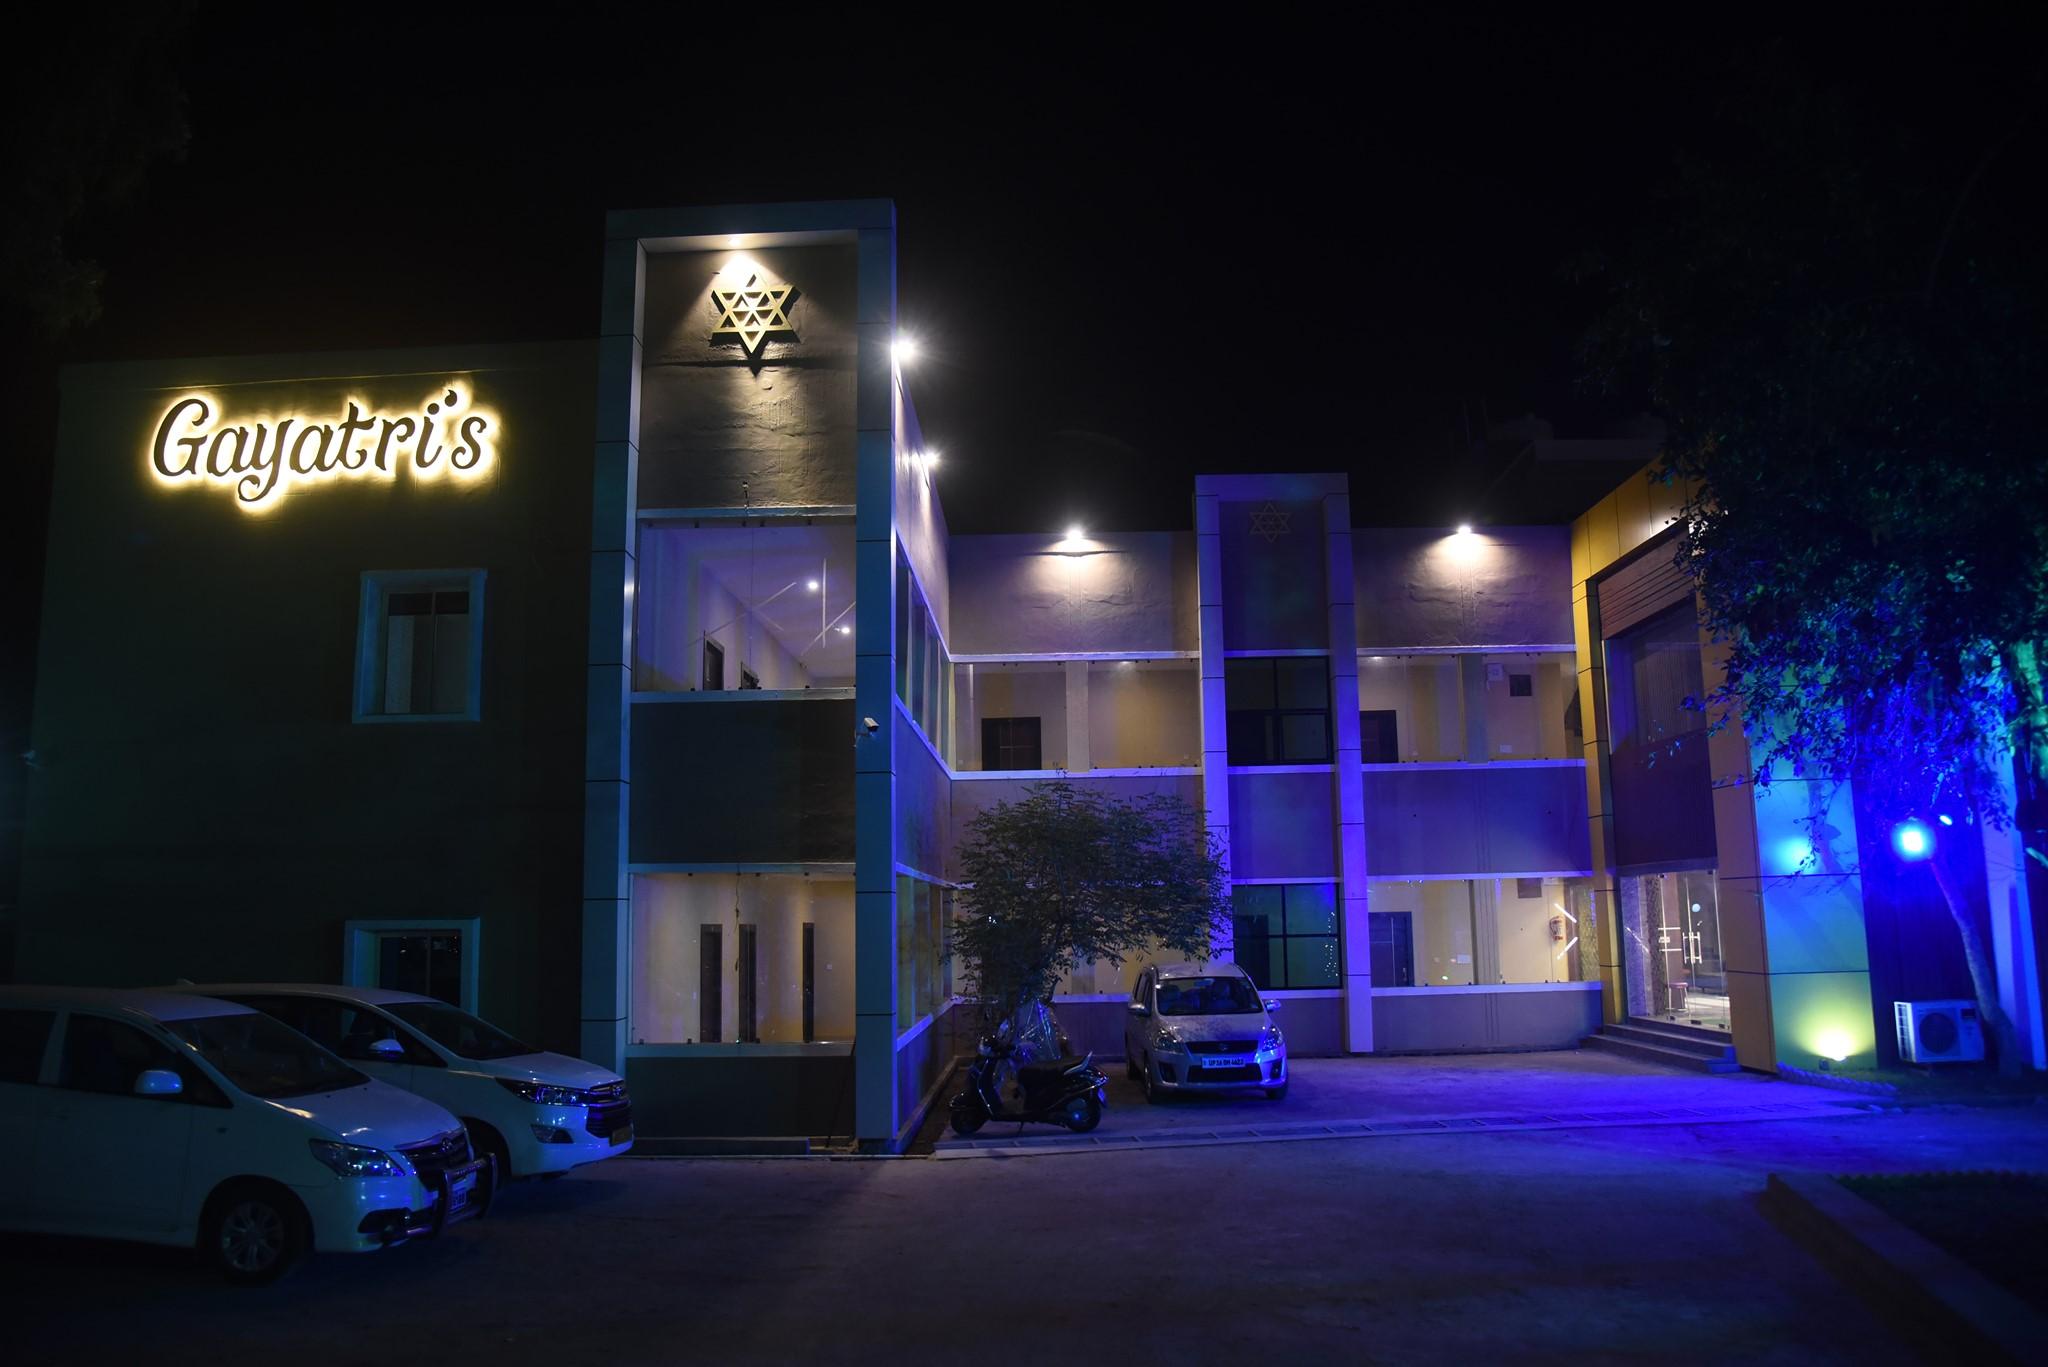 Gayatris Hotel